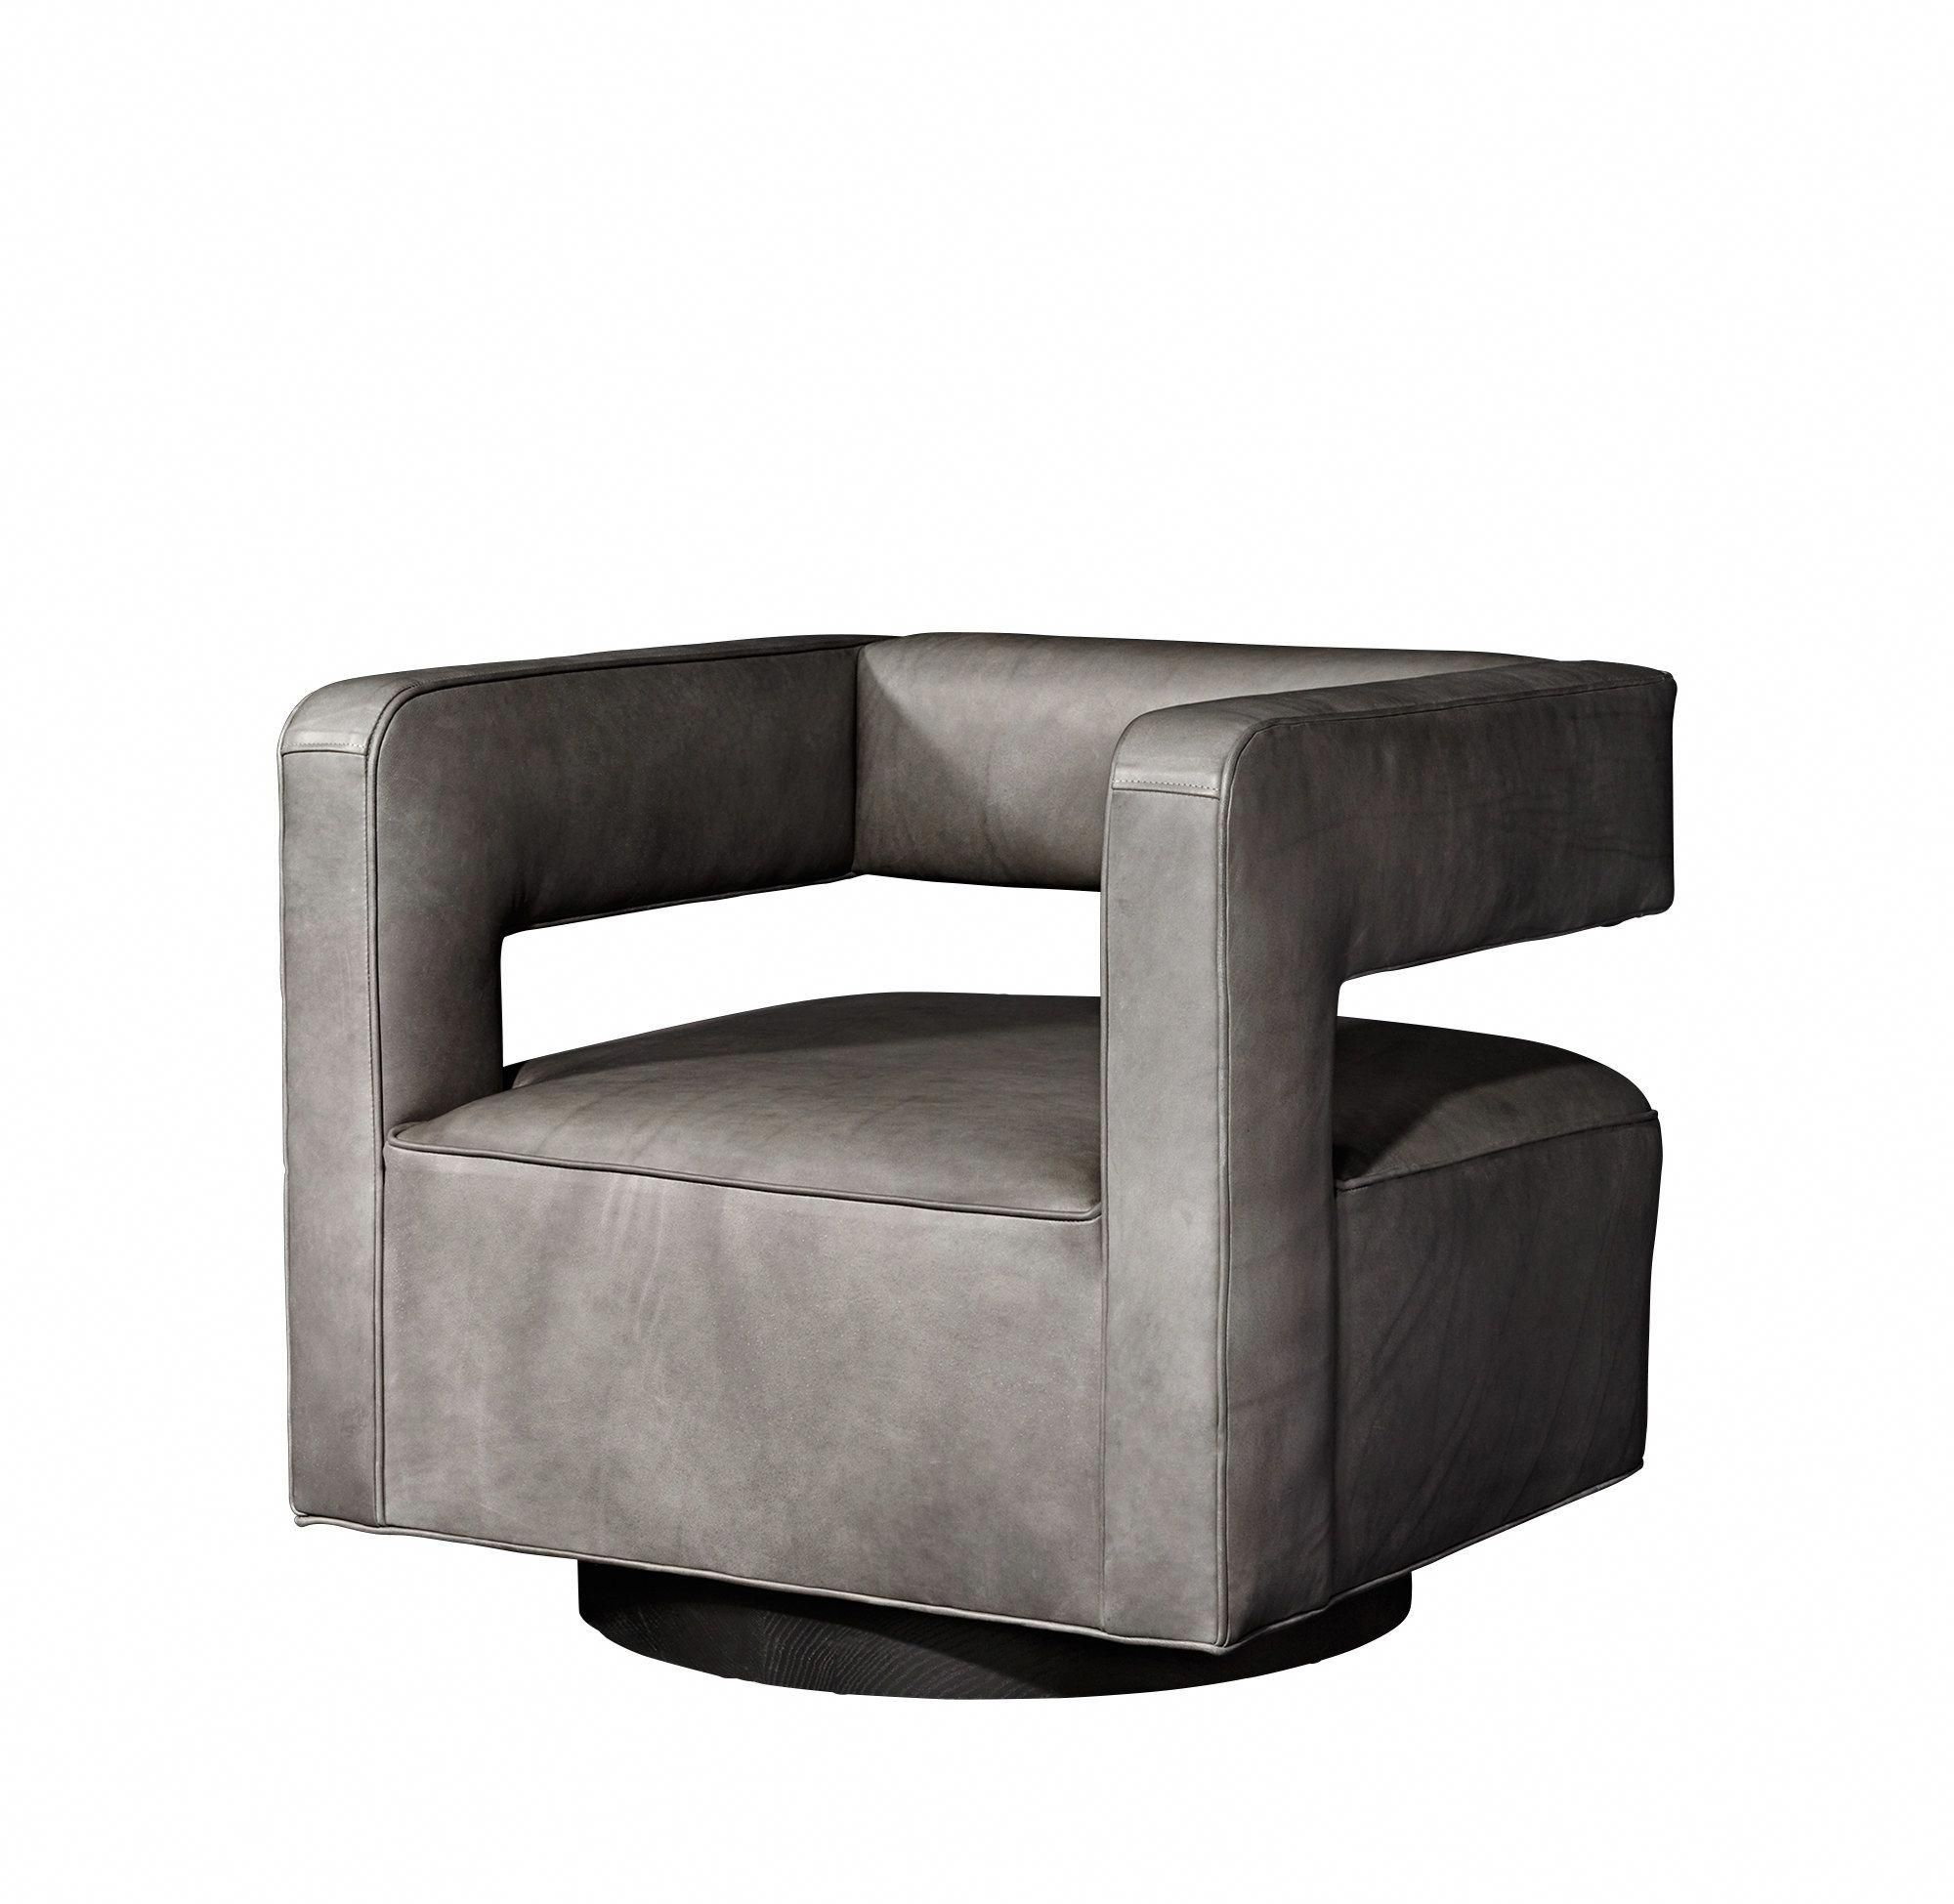 4 Drew Leather Swivel Chair Tq #restorationhardwarechair | Dining pertaining to Gibson Swivel Cuddler Chairs